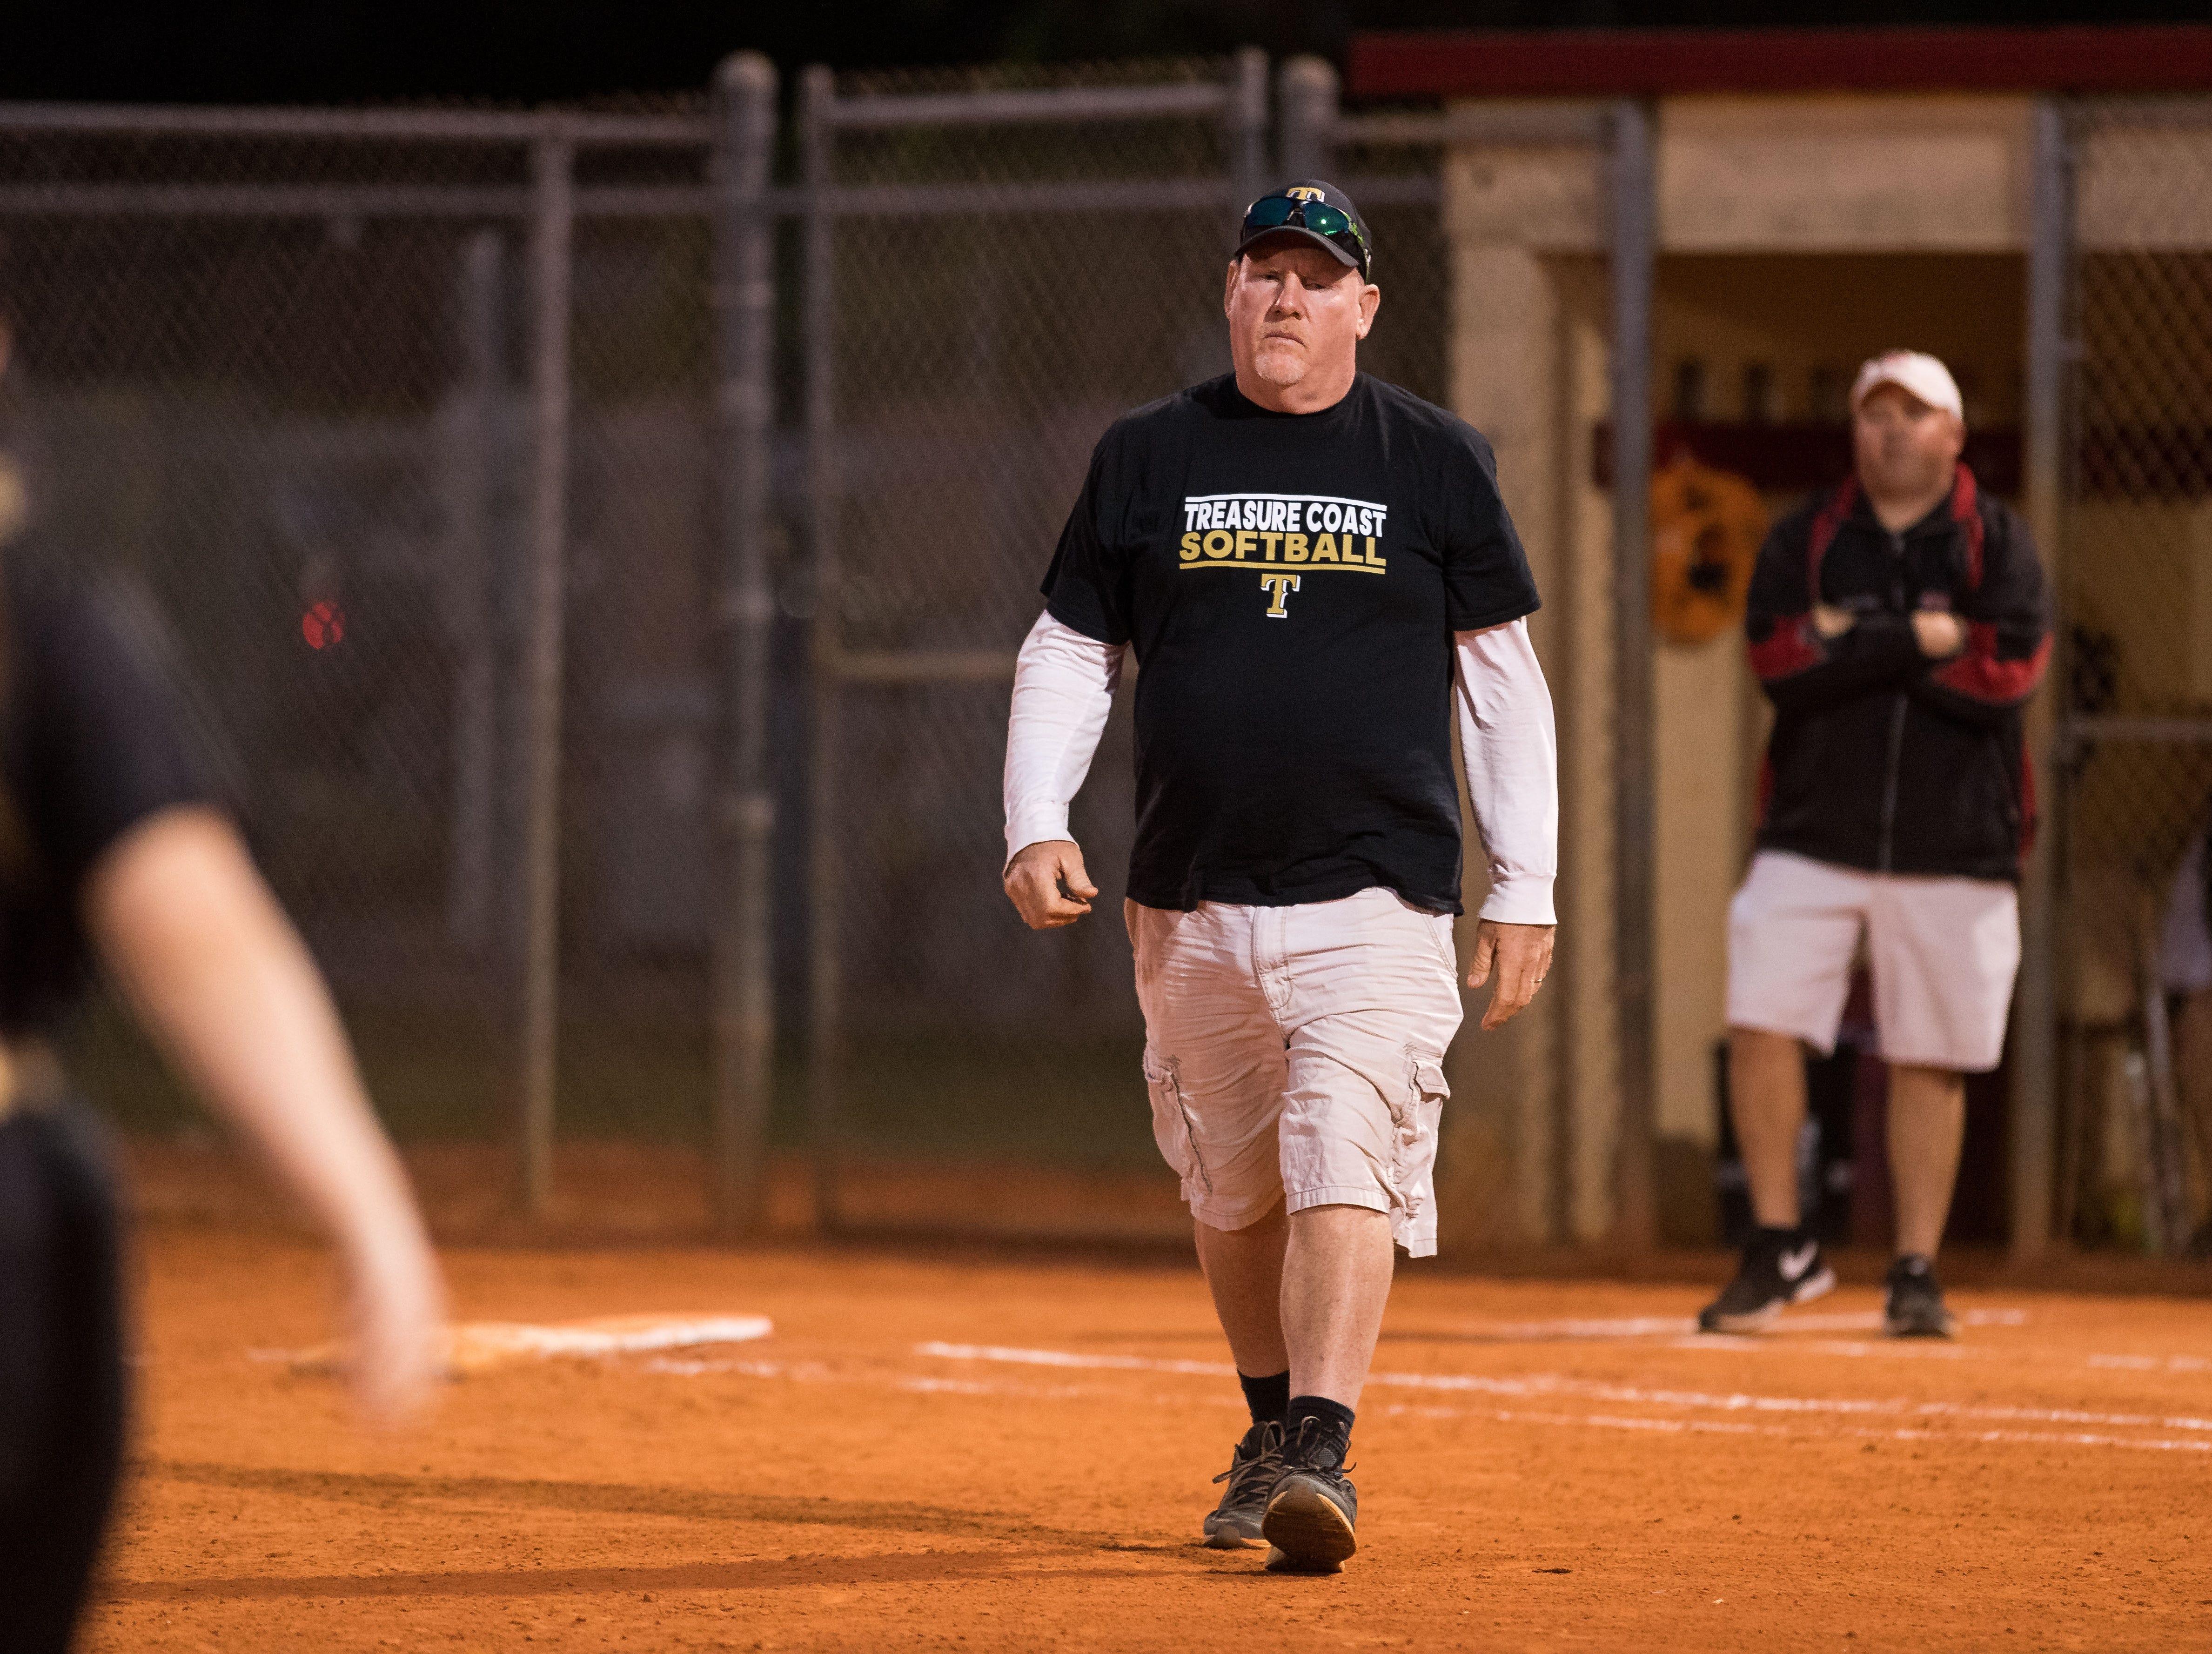 Vero Beach plays against Treasure Coast during the high school softball game Friday, March 29, 2019, at Vero Beach High School.